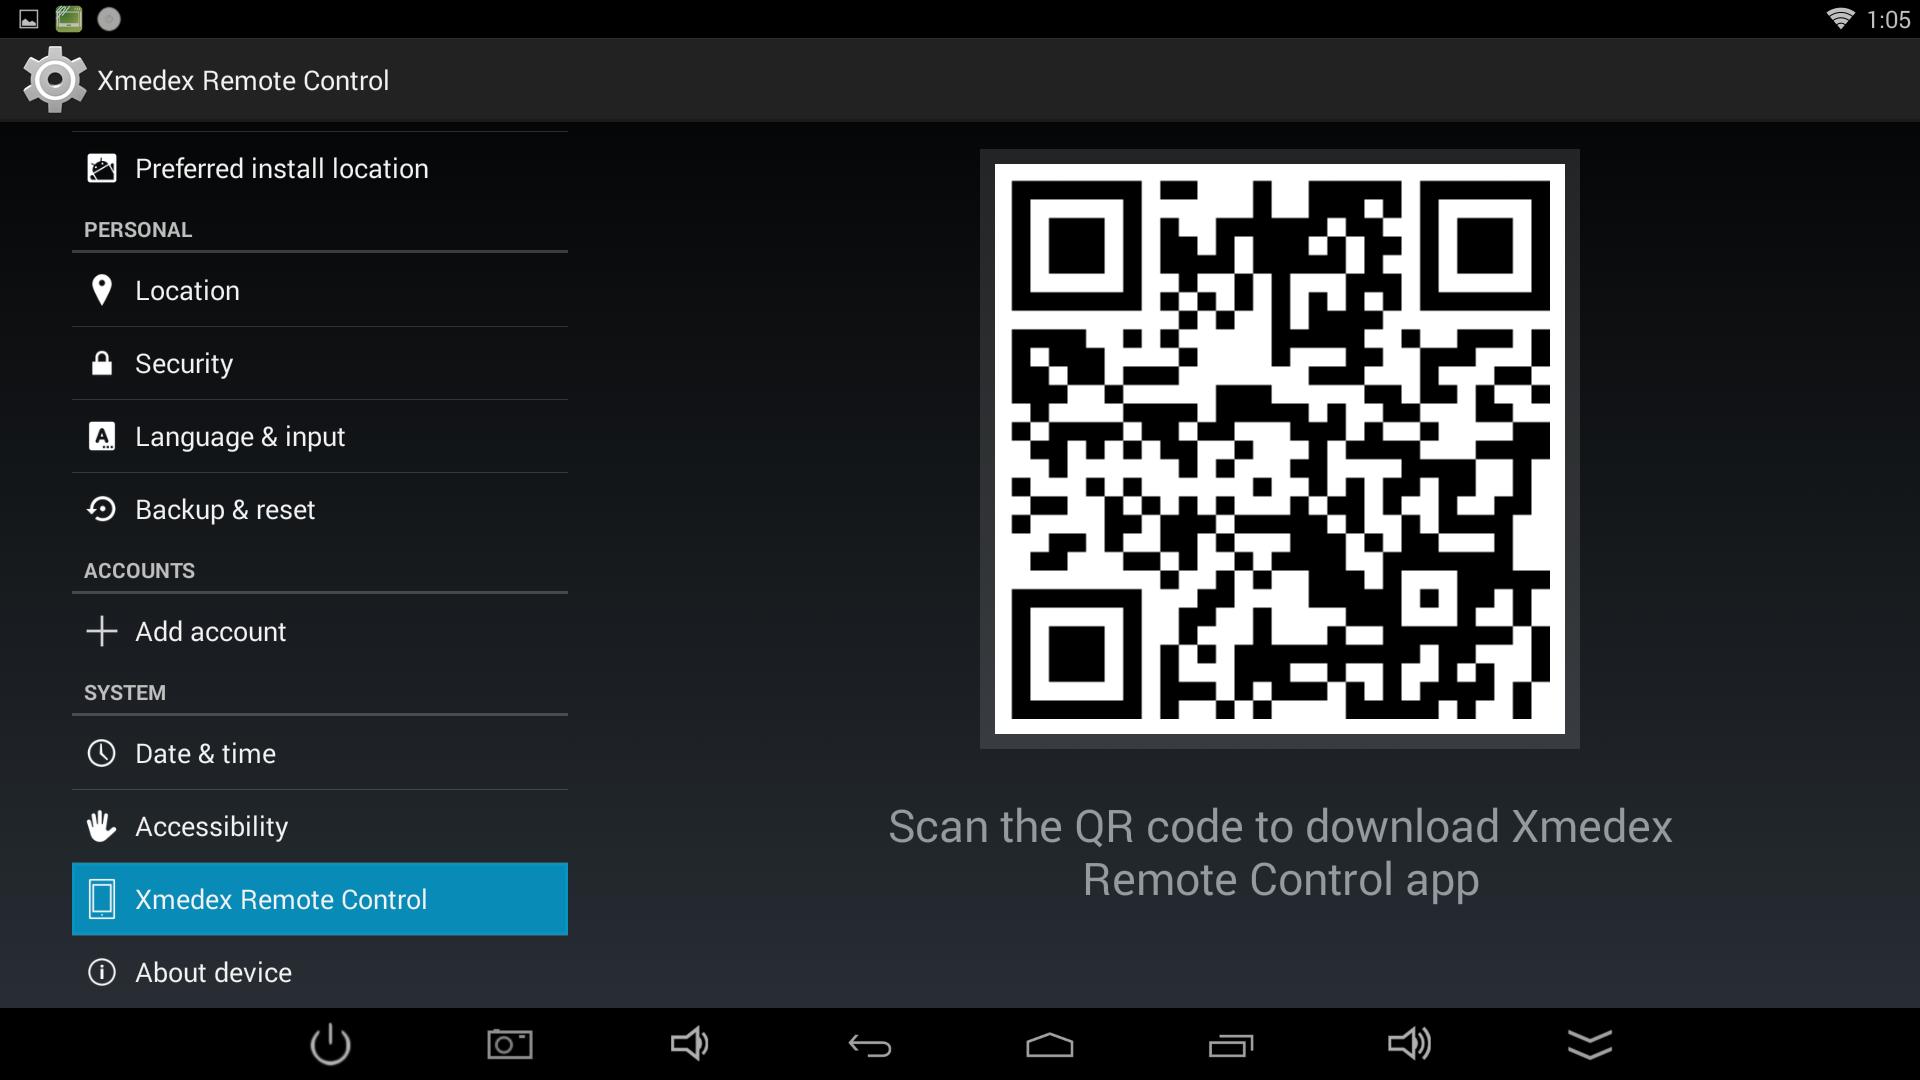 xmedex remote control app